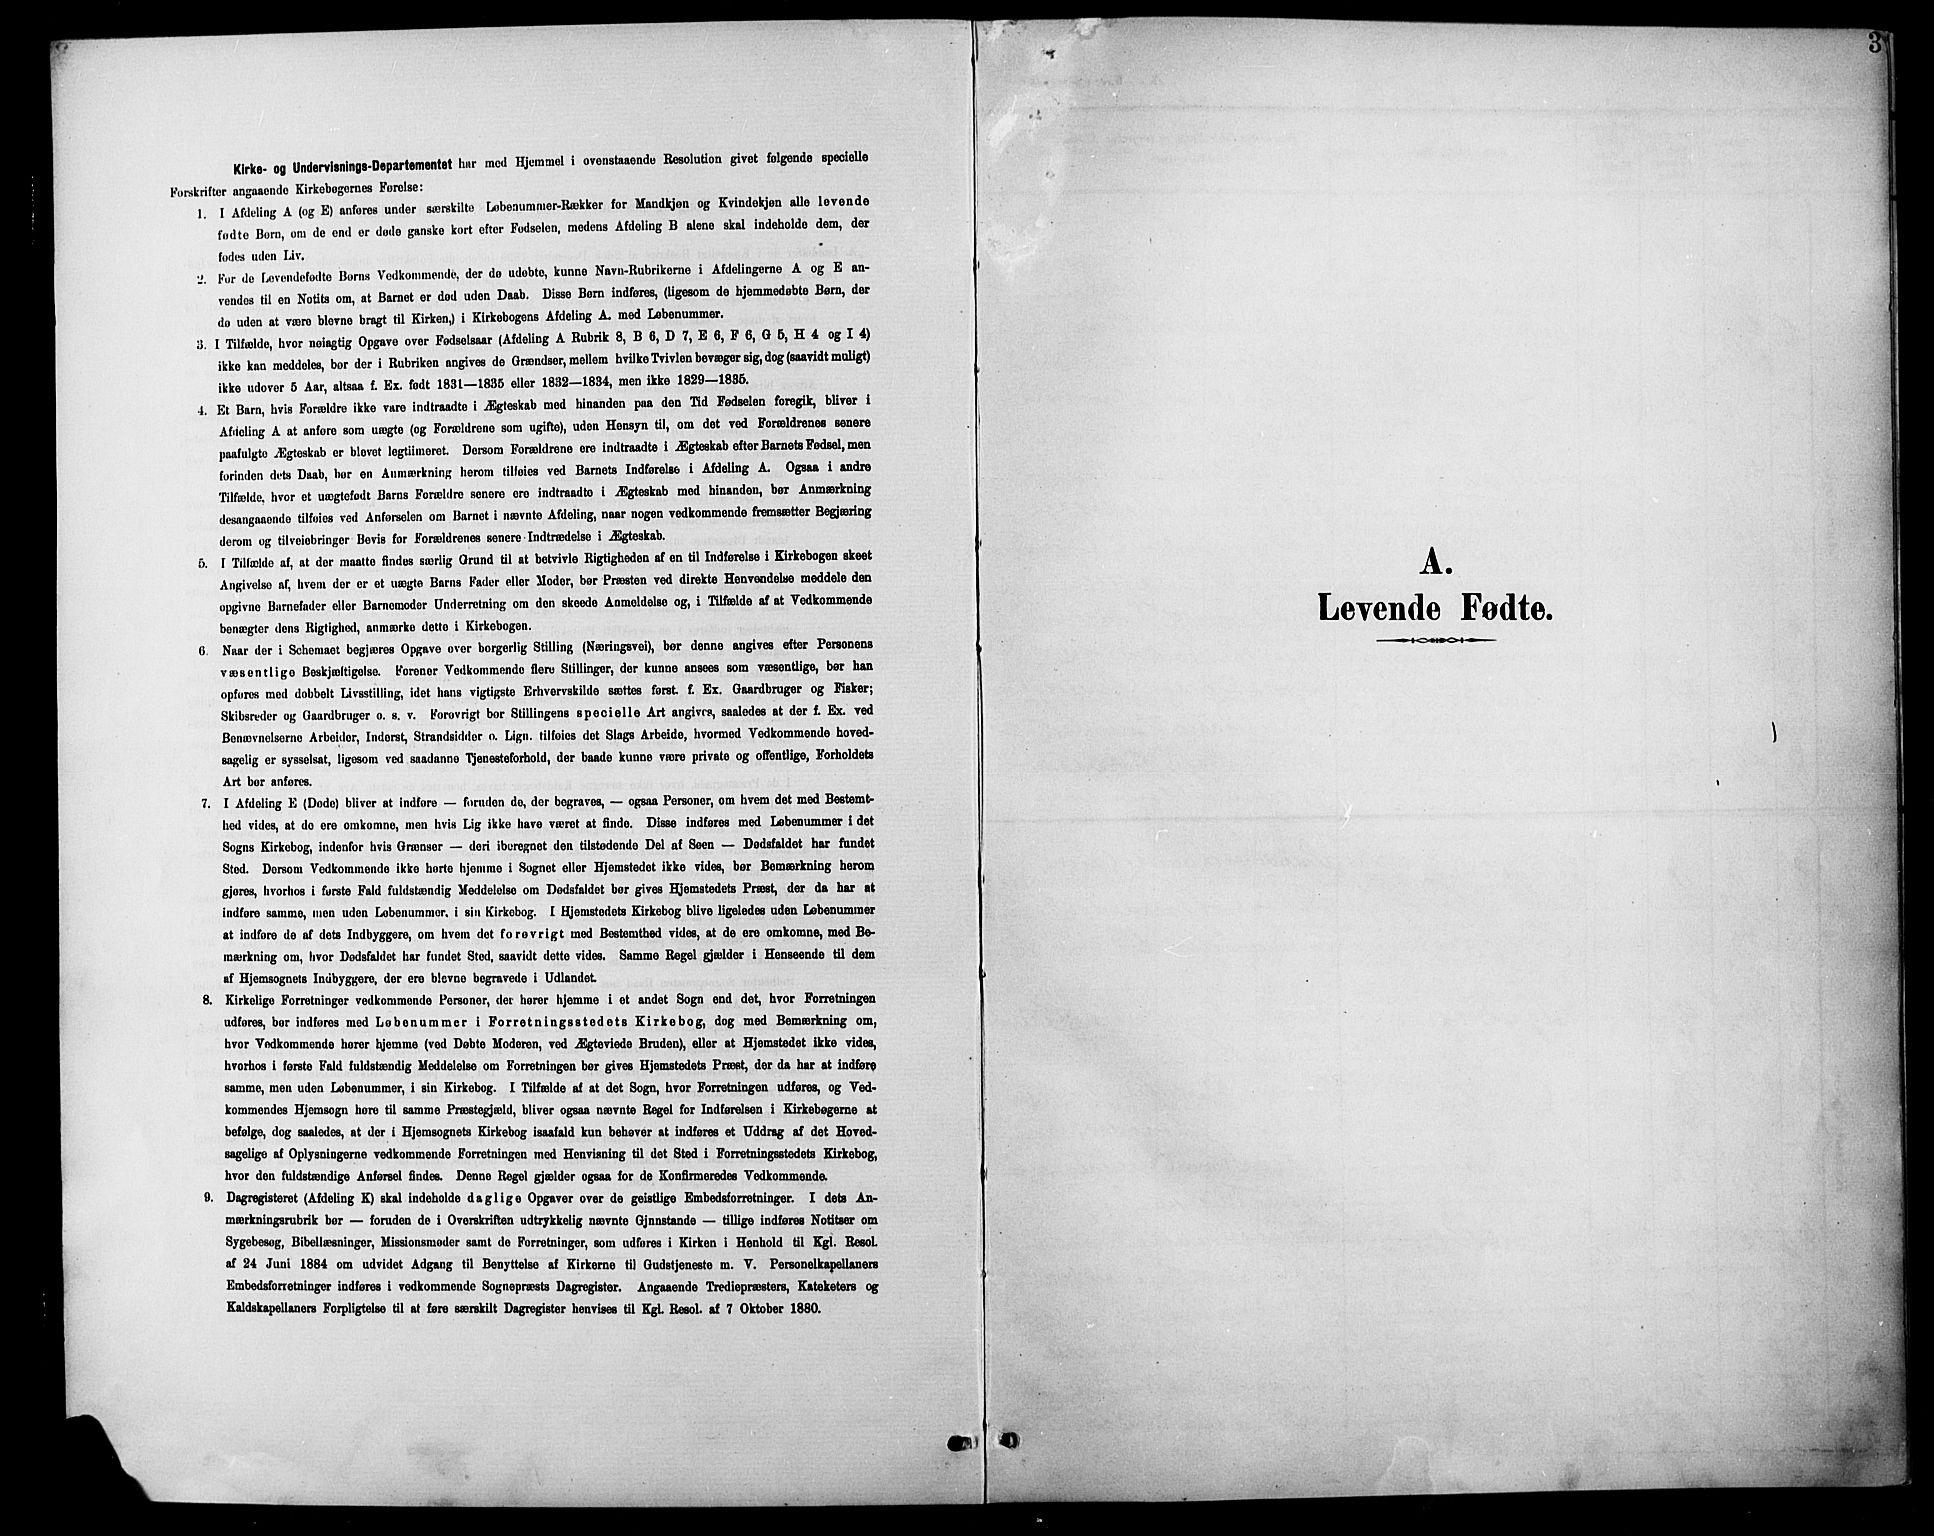 SAH, Søndre Land prestekontor, L/L0004: Klokkerbok nr. 4, 1901-1915, s. 3